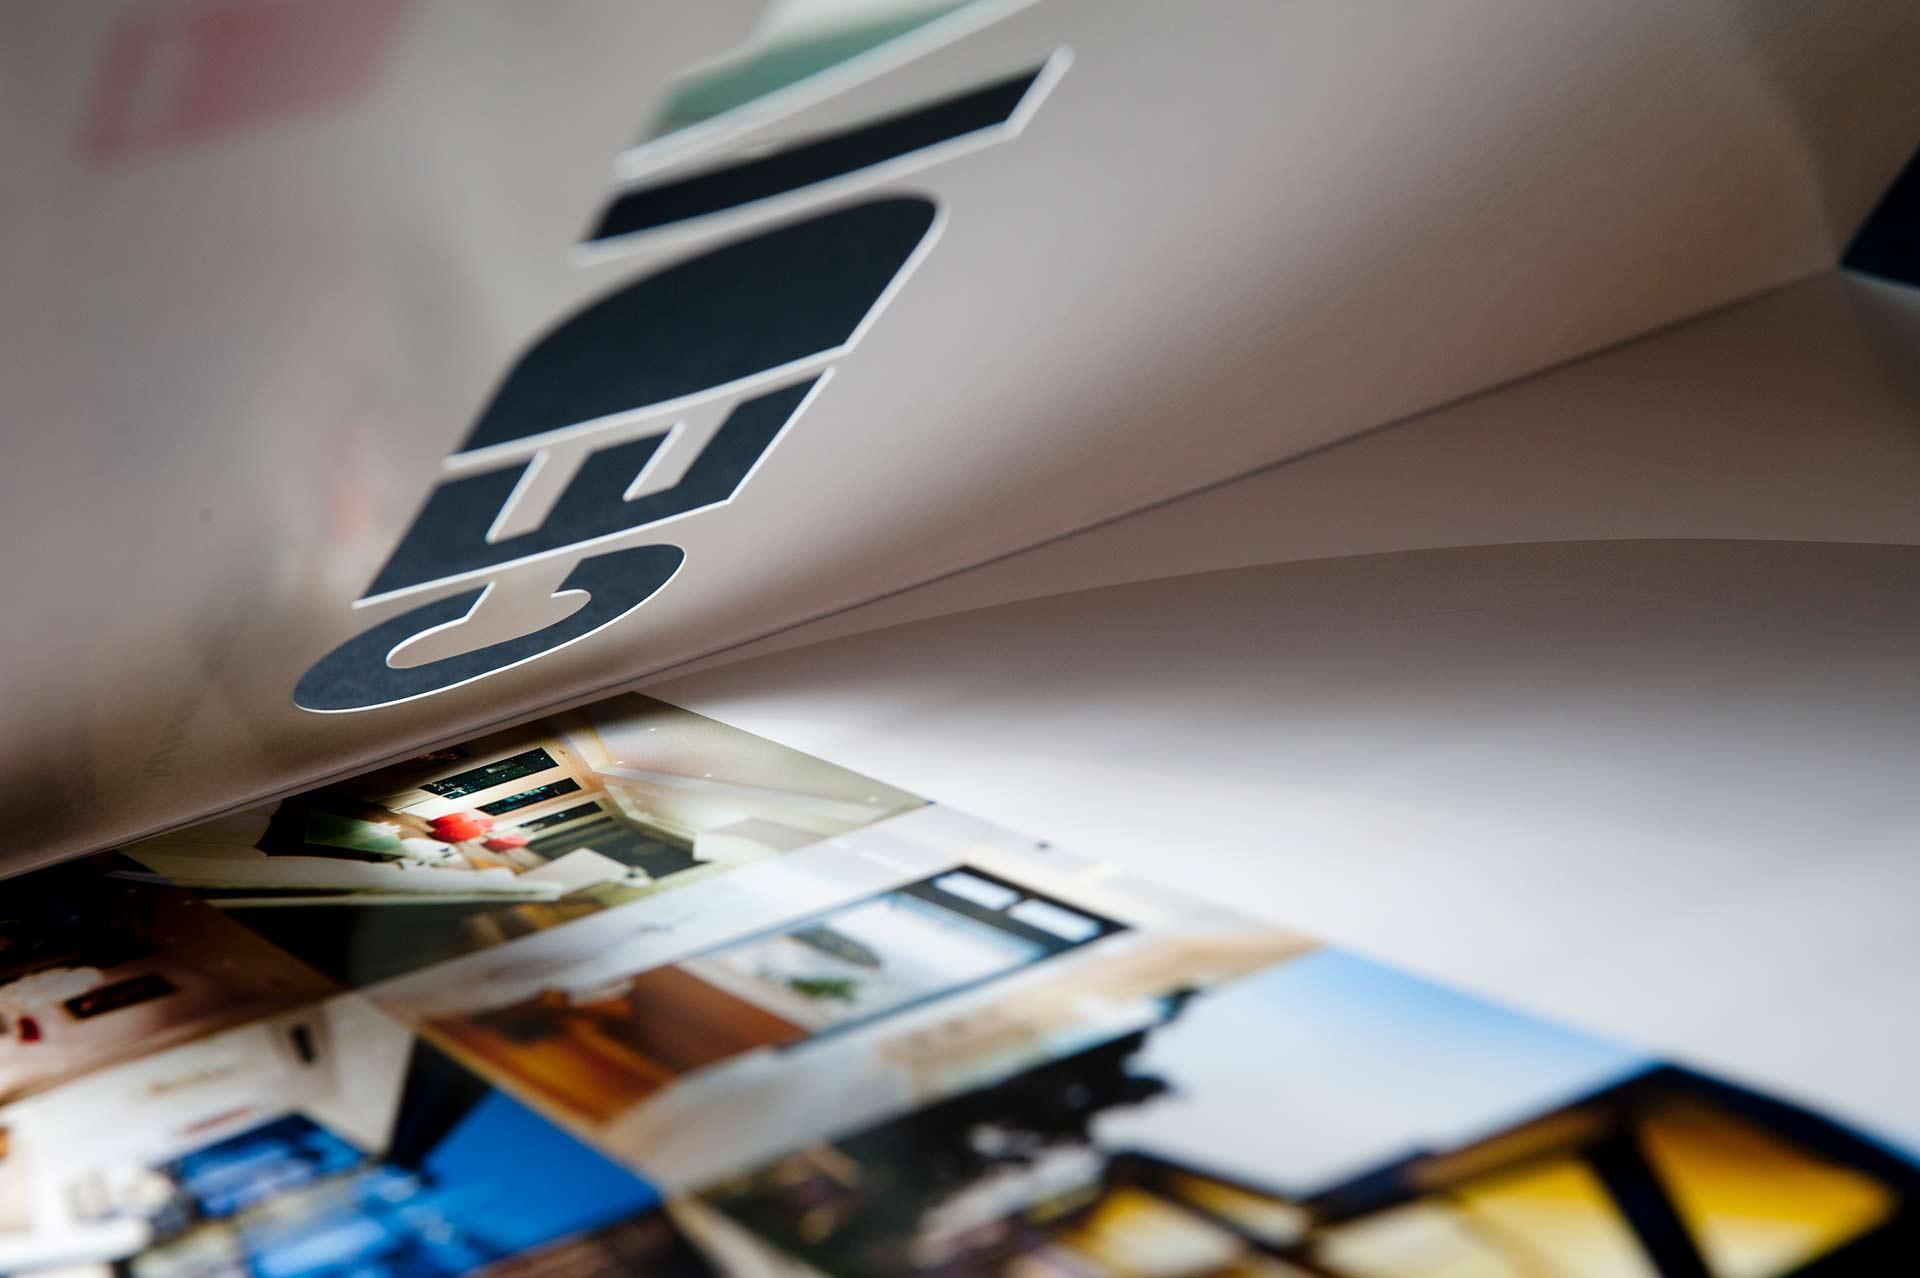 cedia-folder1.jpg